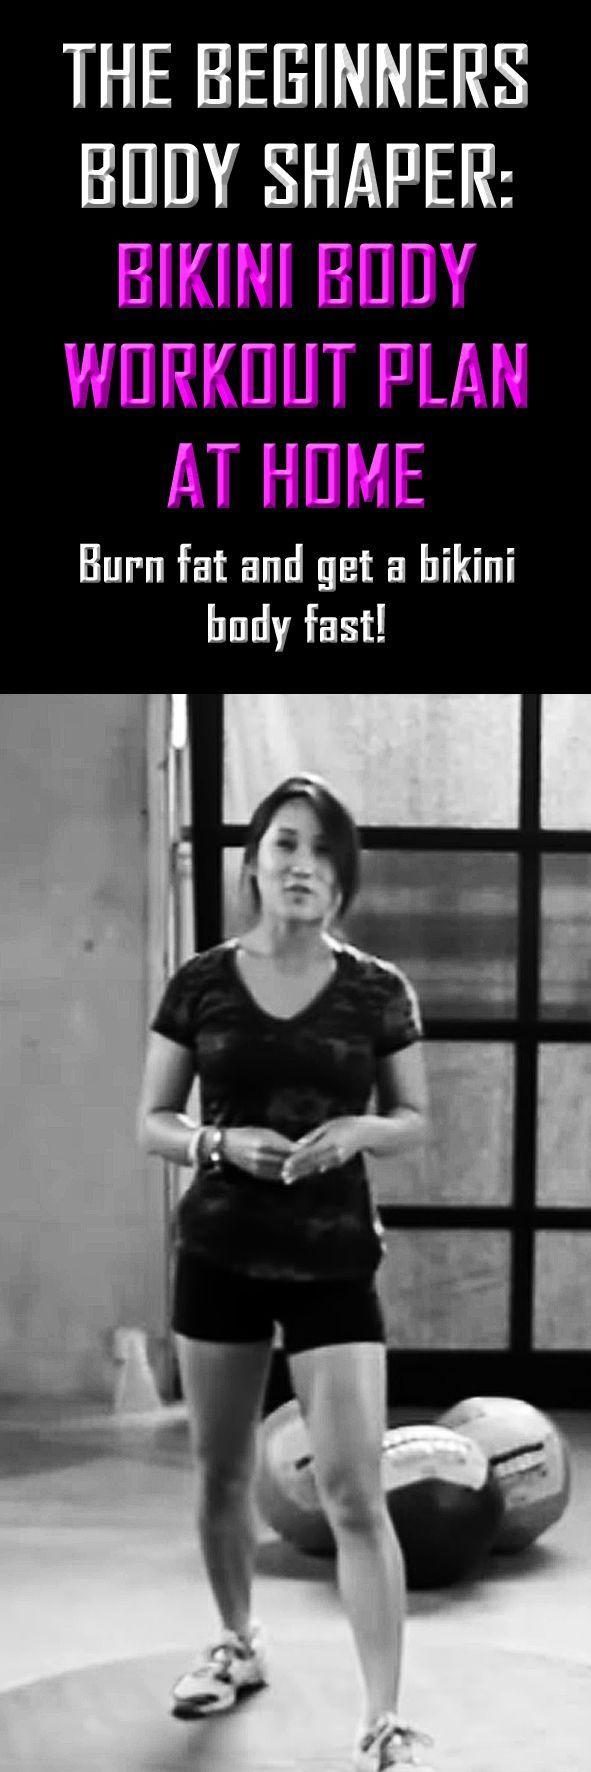 Burn fat & get a bikini body fast! #fullbodyworkout #beginnerworkout #bikiniworkout #getfit #toneup #fatburn